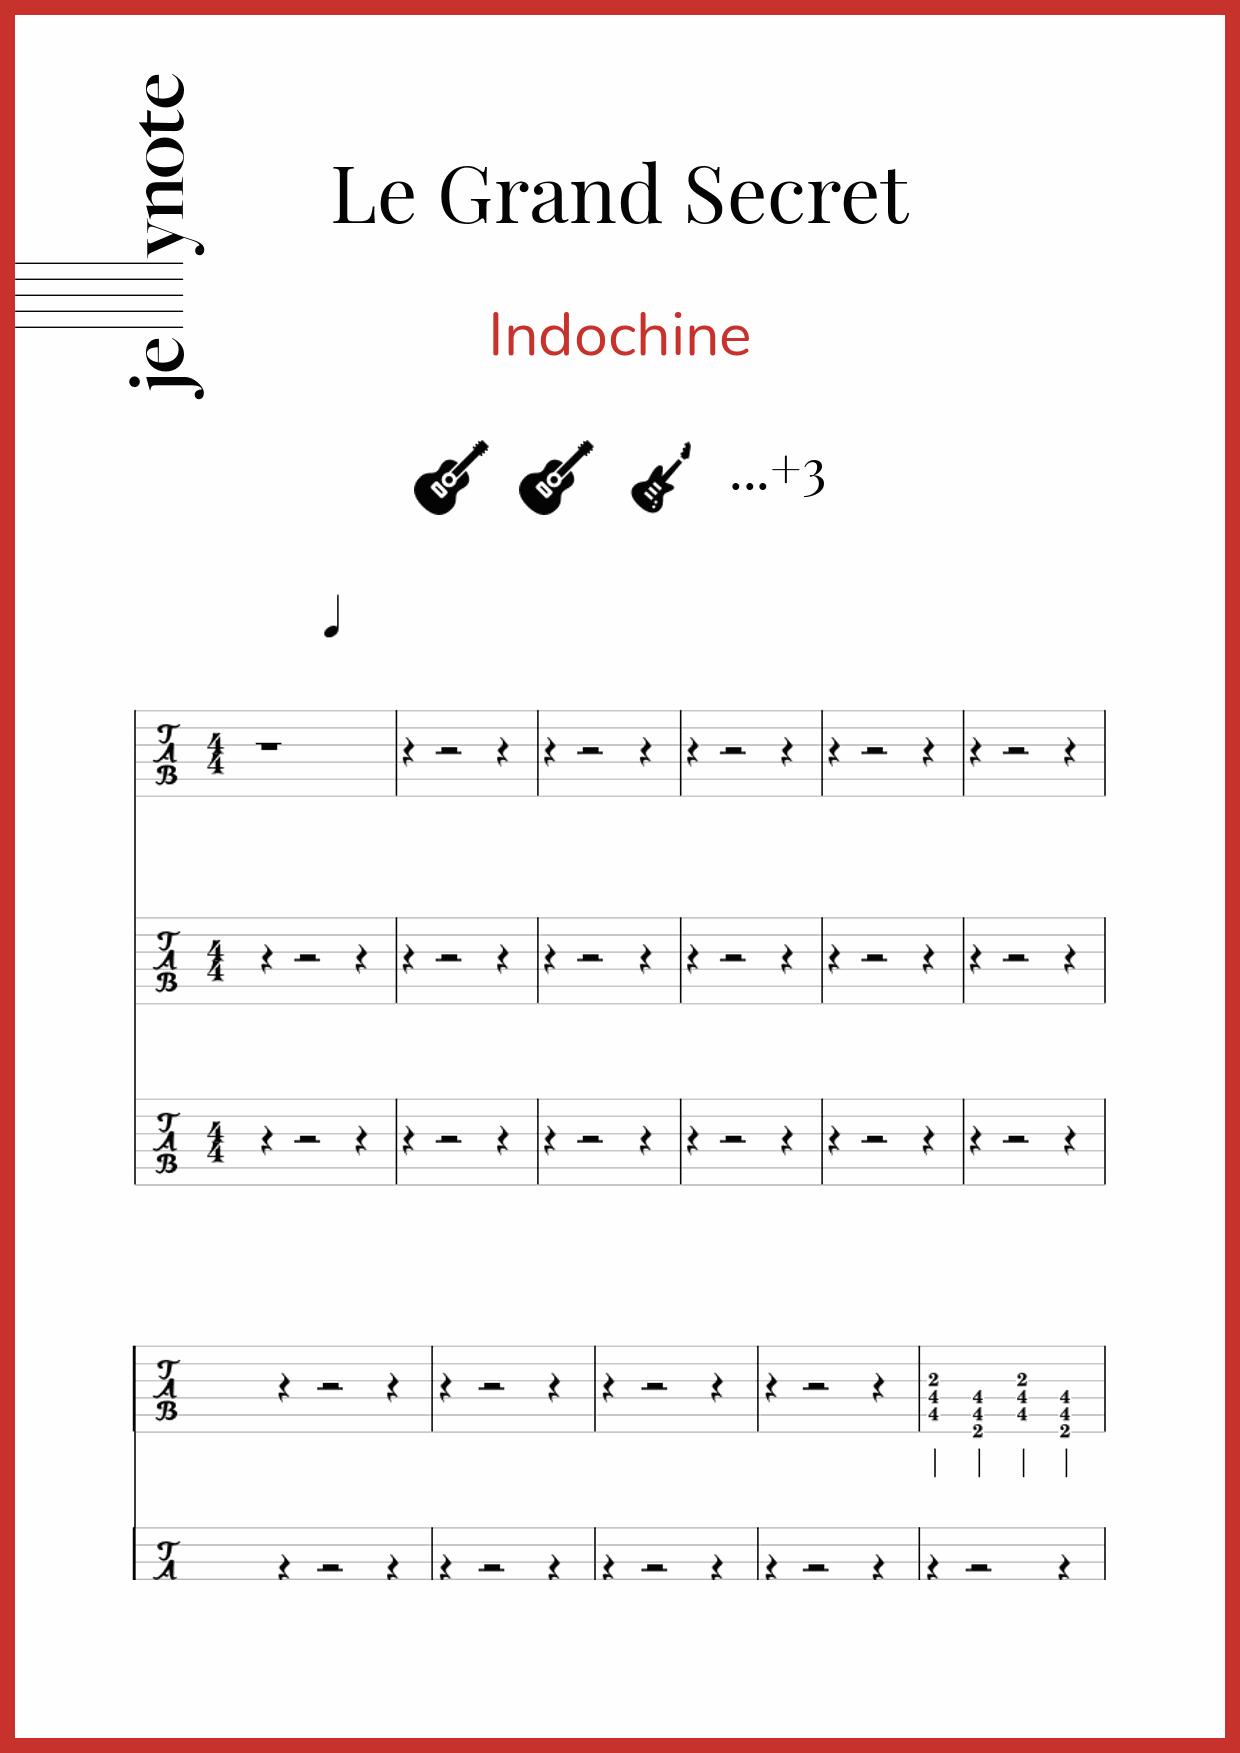 Indochine Le Grand Secret : indochine, grand, secret, Indochine, Grand, Secret